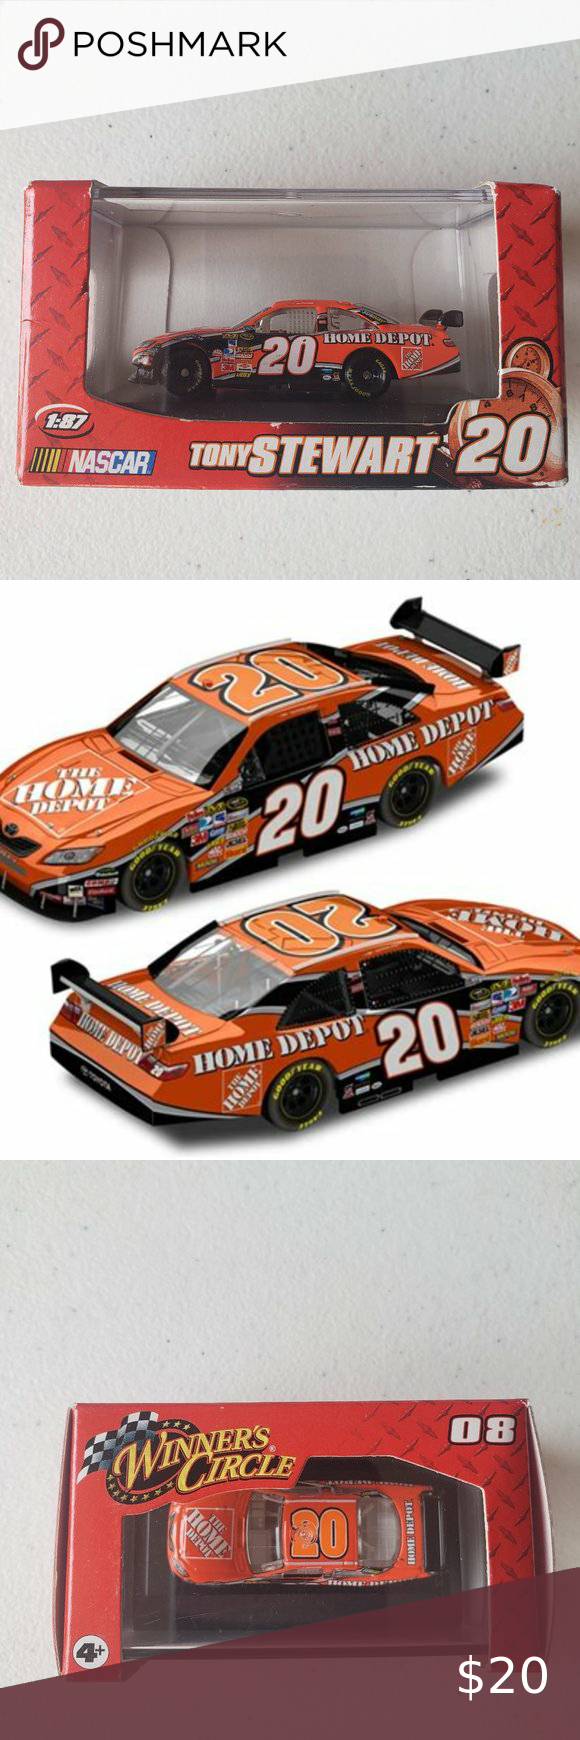 Nascar 2008 Tony Stewart 20 Home Depot In 2020 Nascar Toys Nascar Nascar Racing